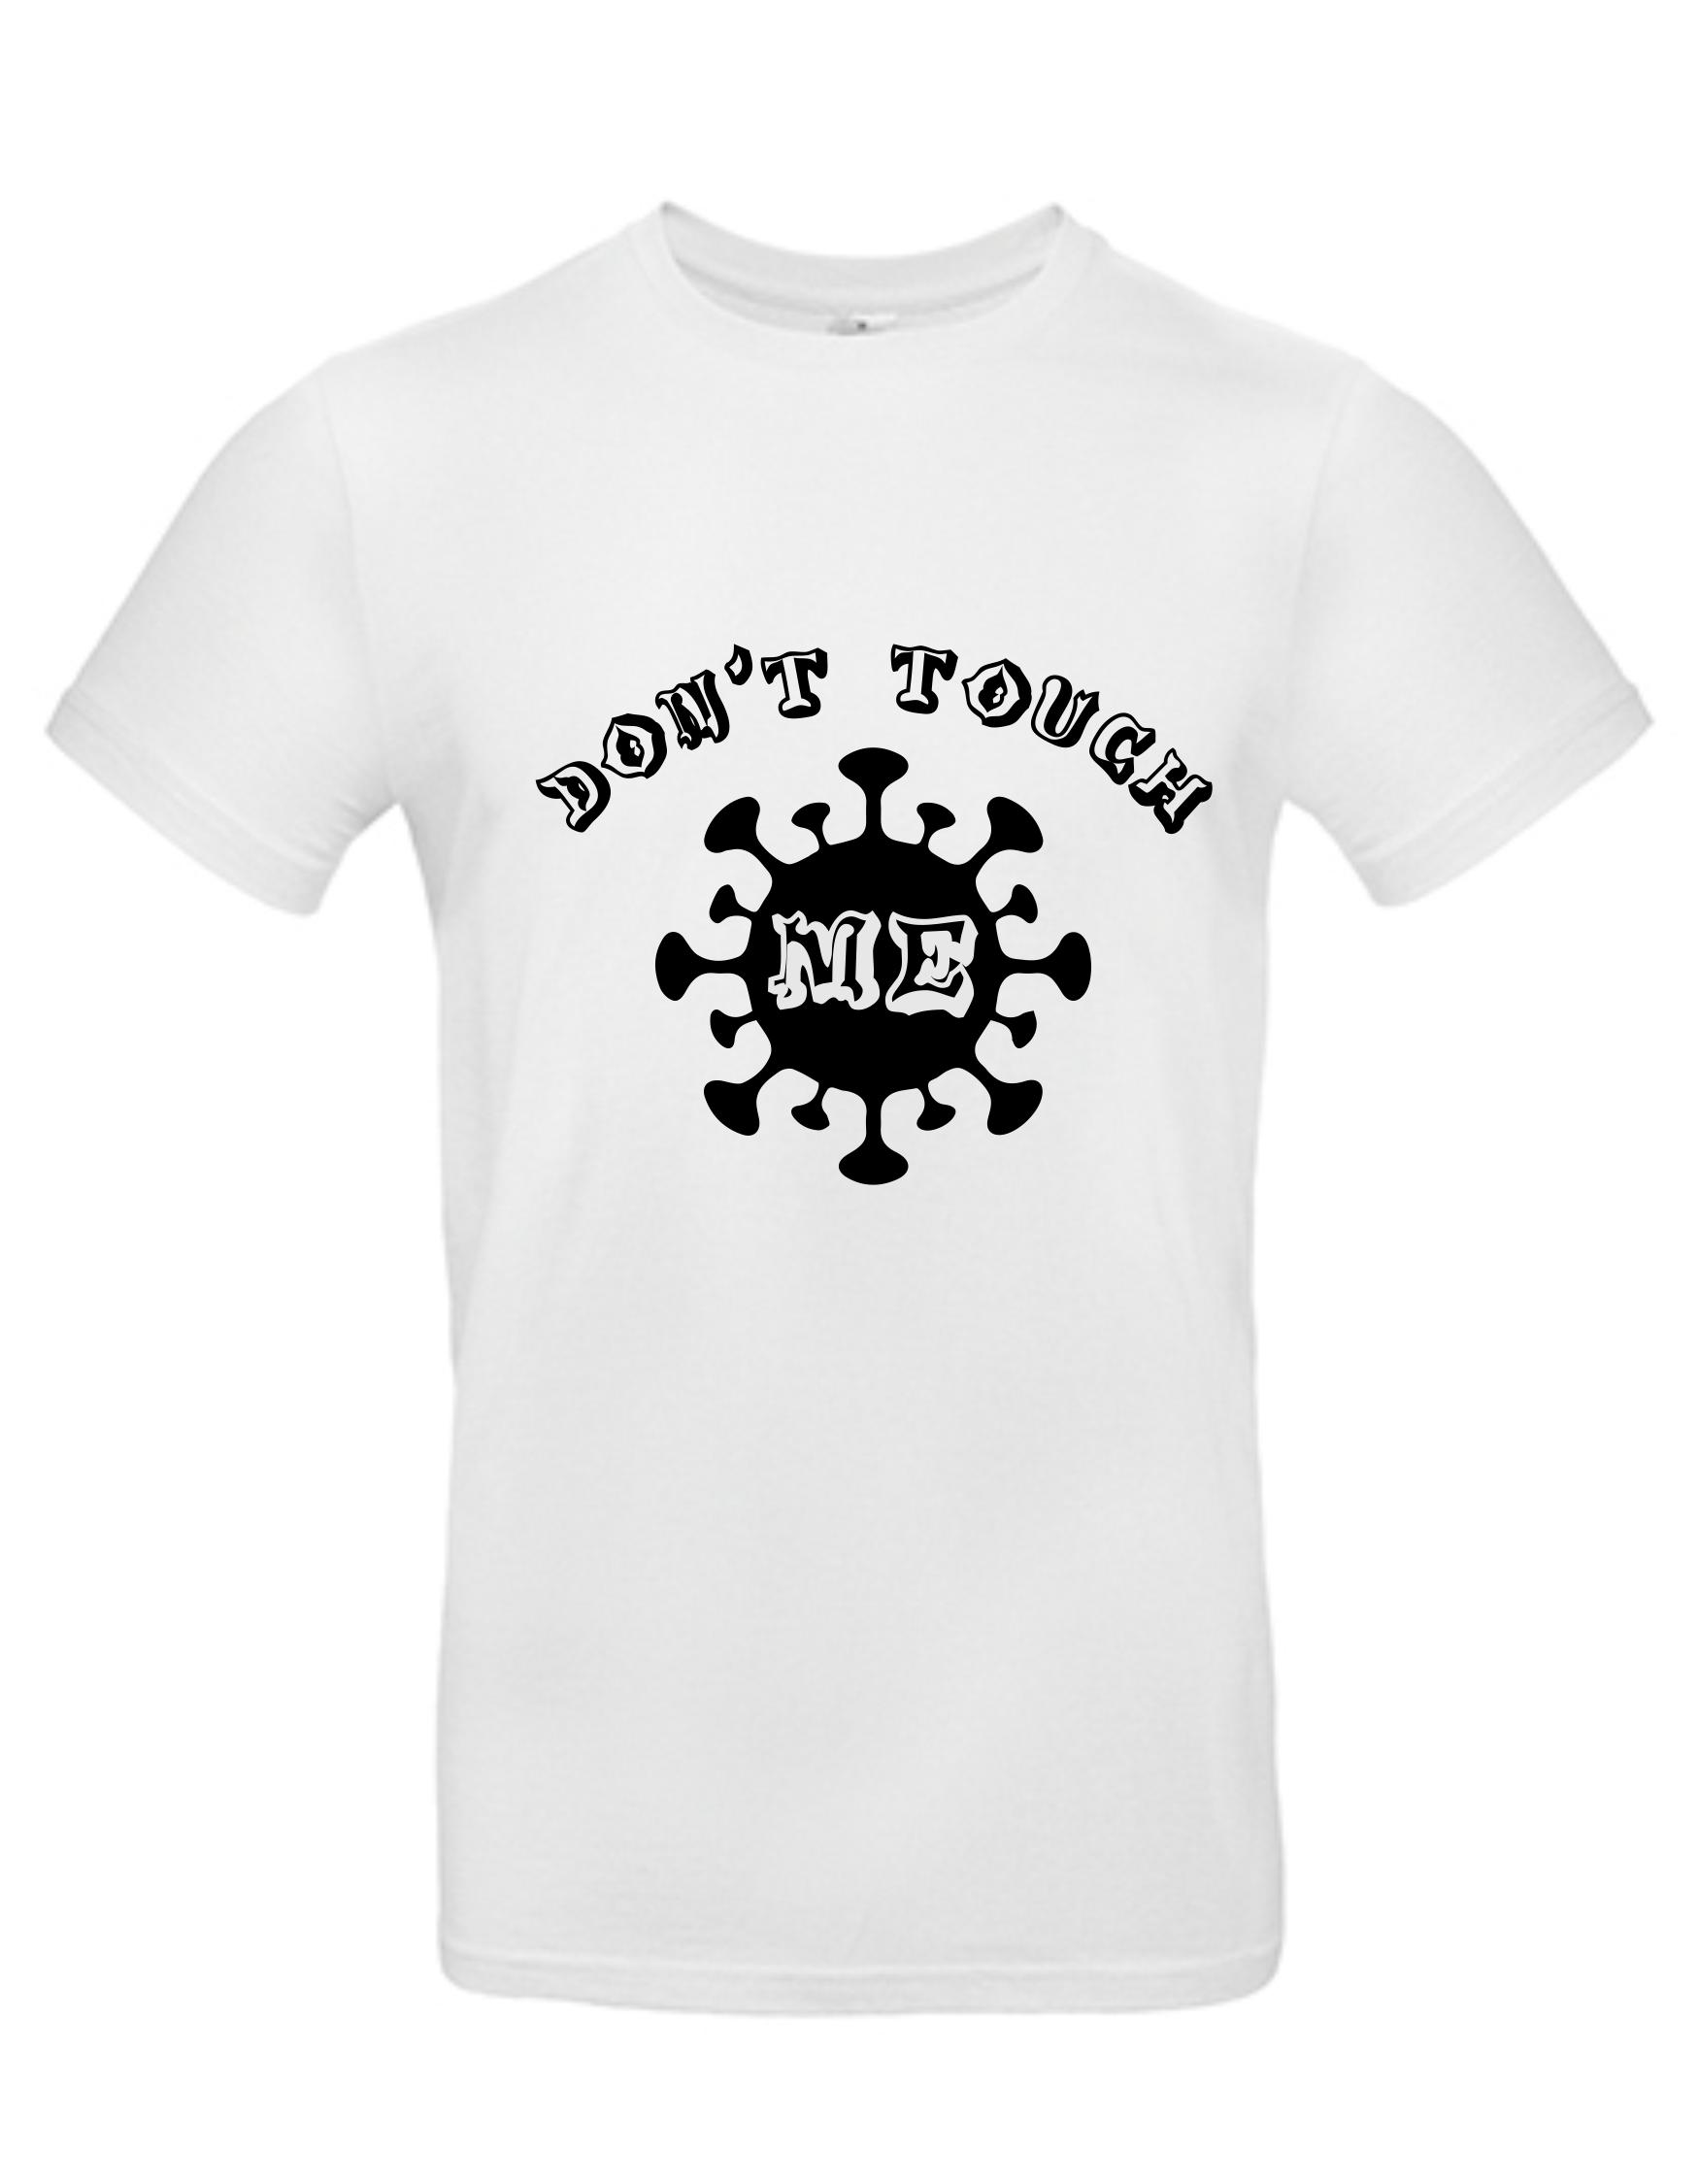 Corona T-Shirt #E190  DON'T TOUCH ME